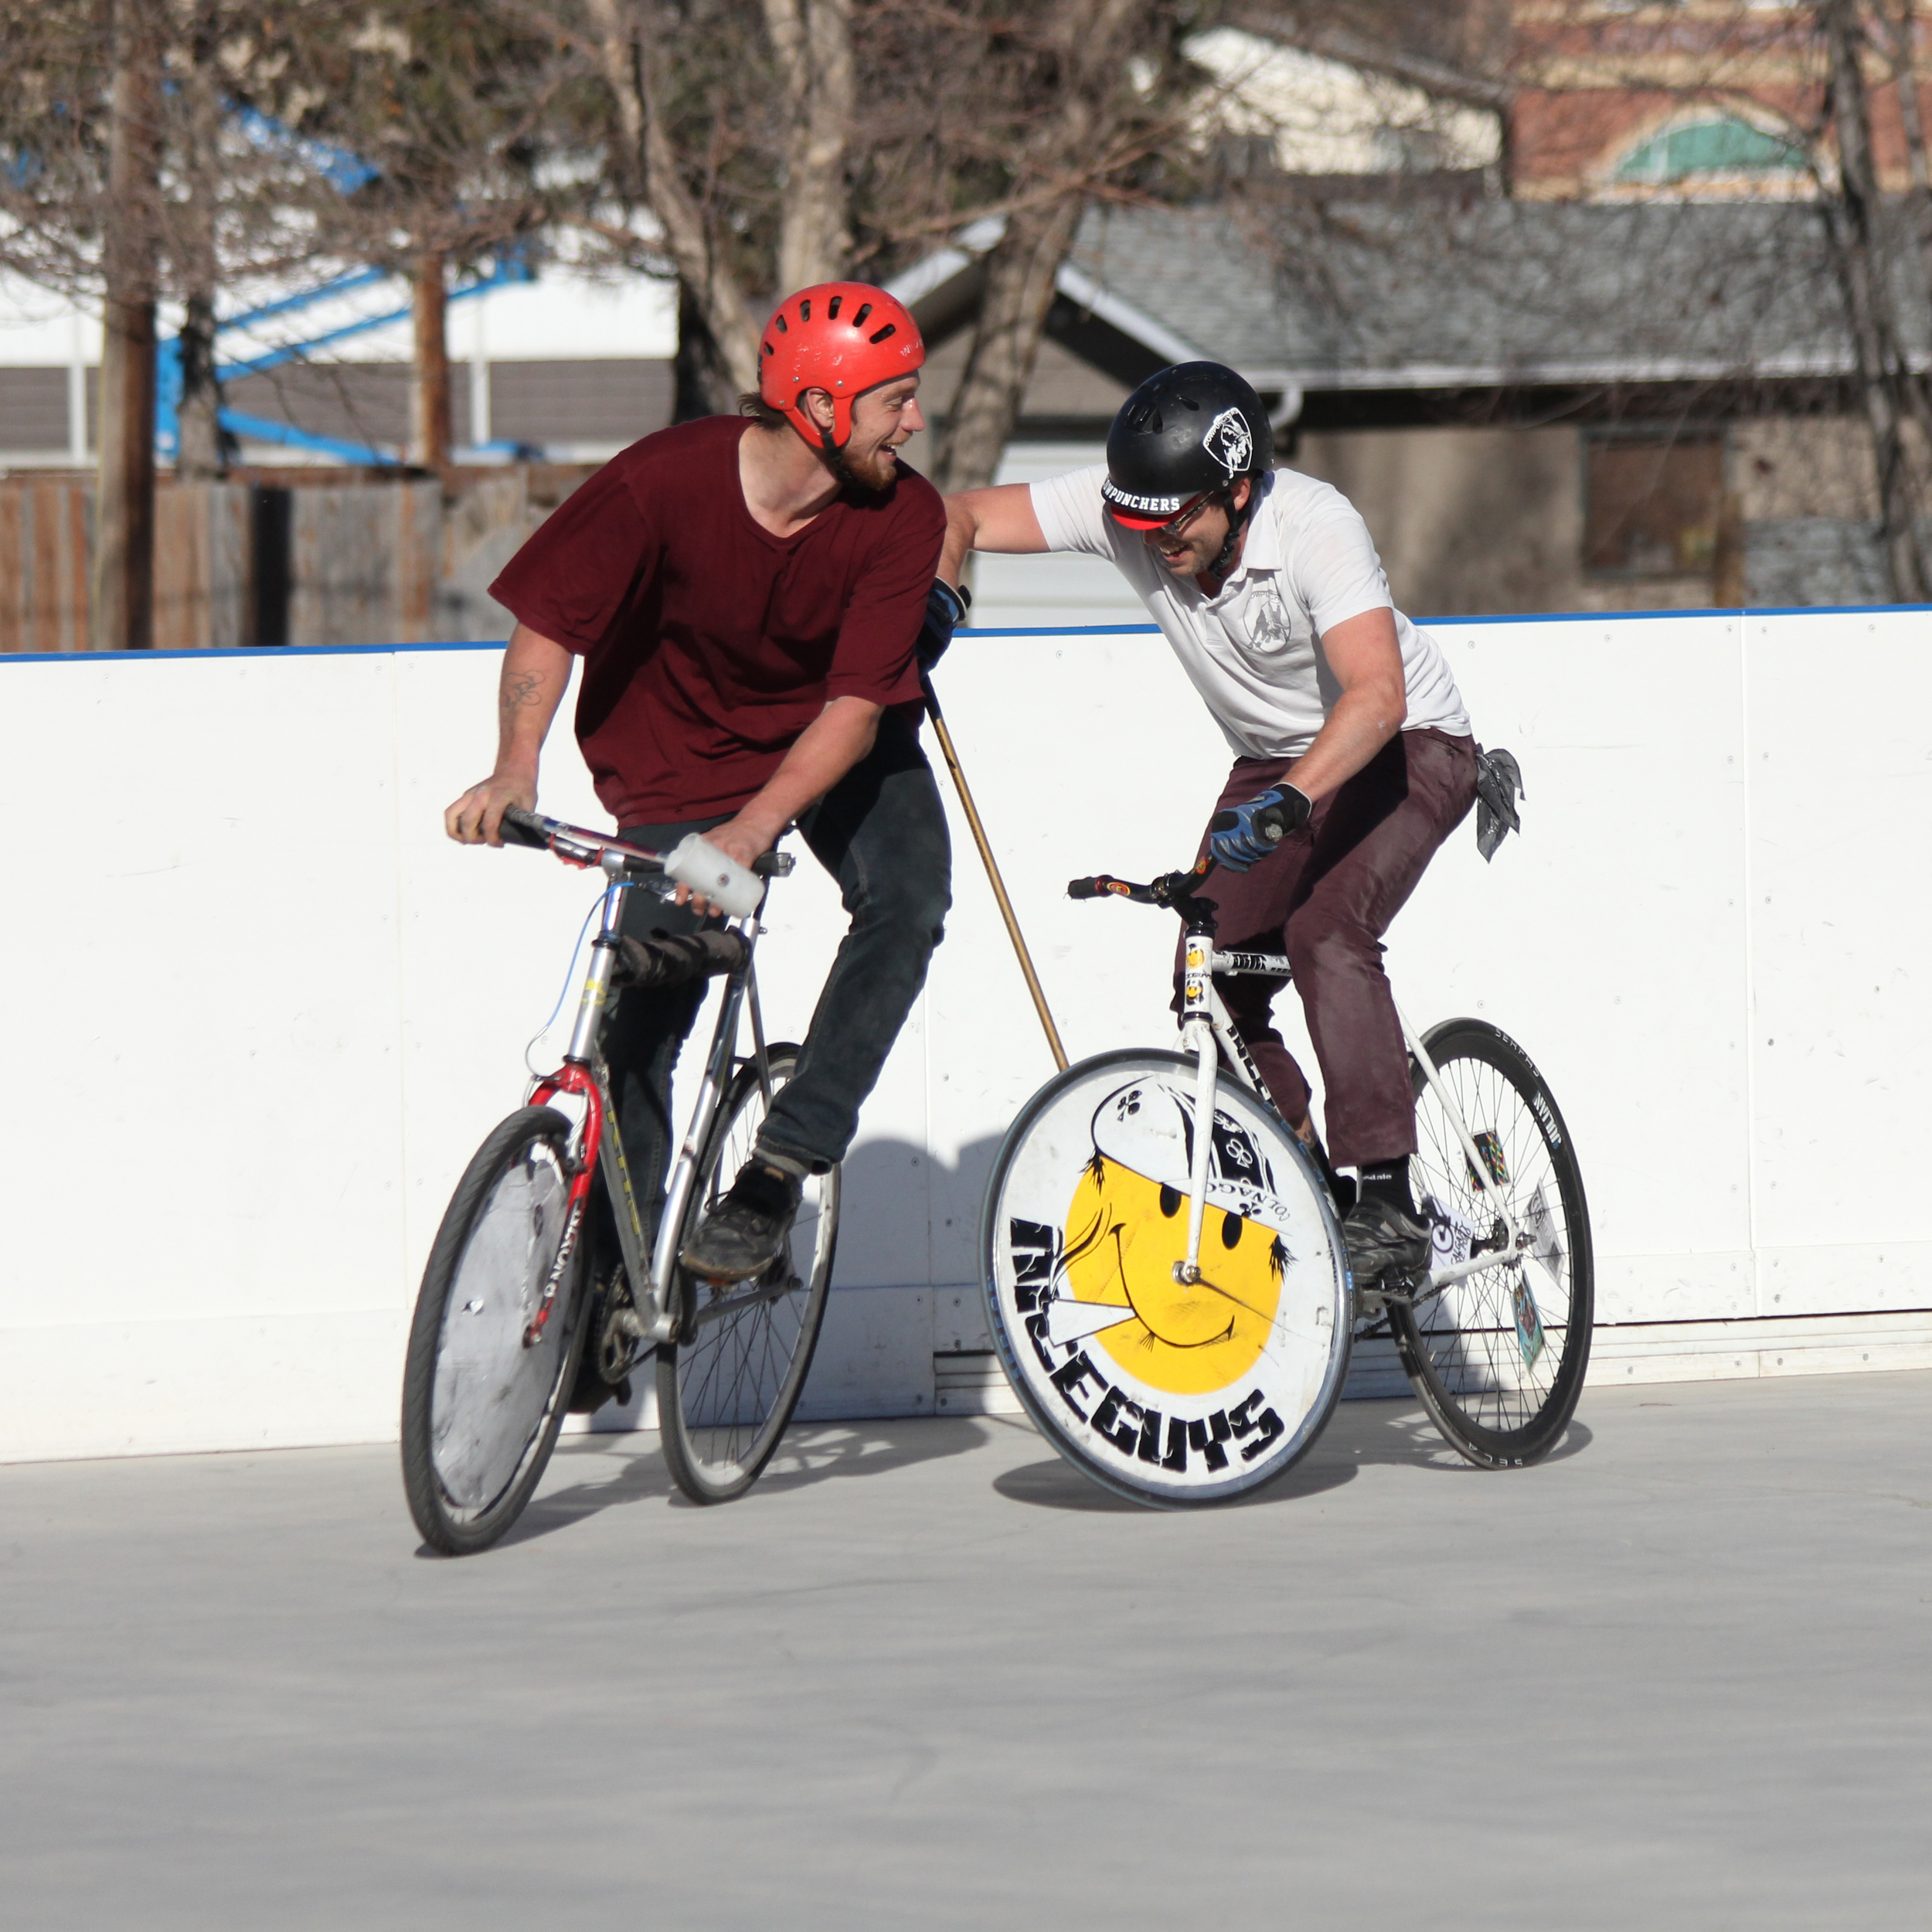 Photo   : Bike polo in Inglewood    Credit   : Willis Hoff